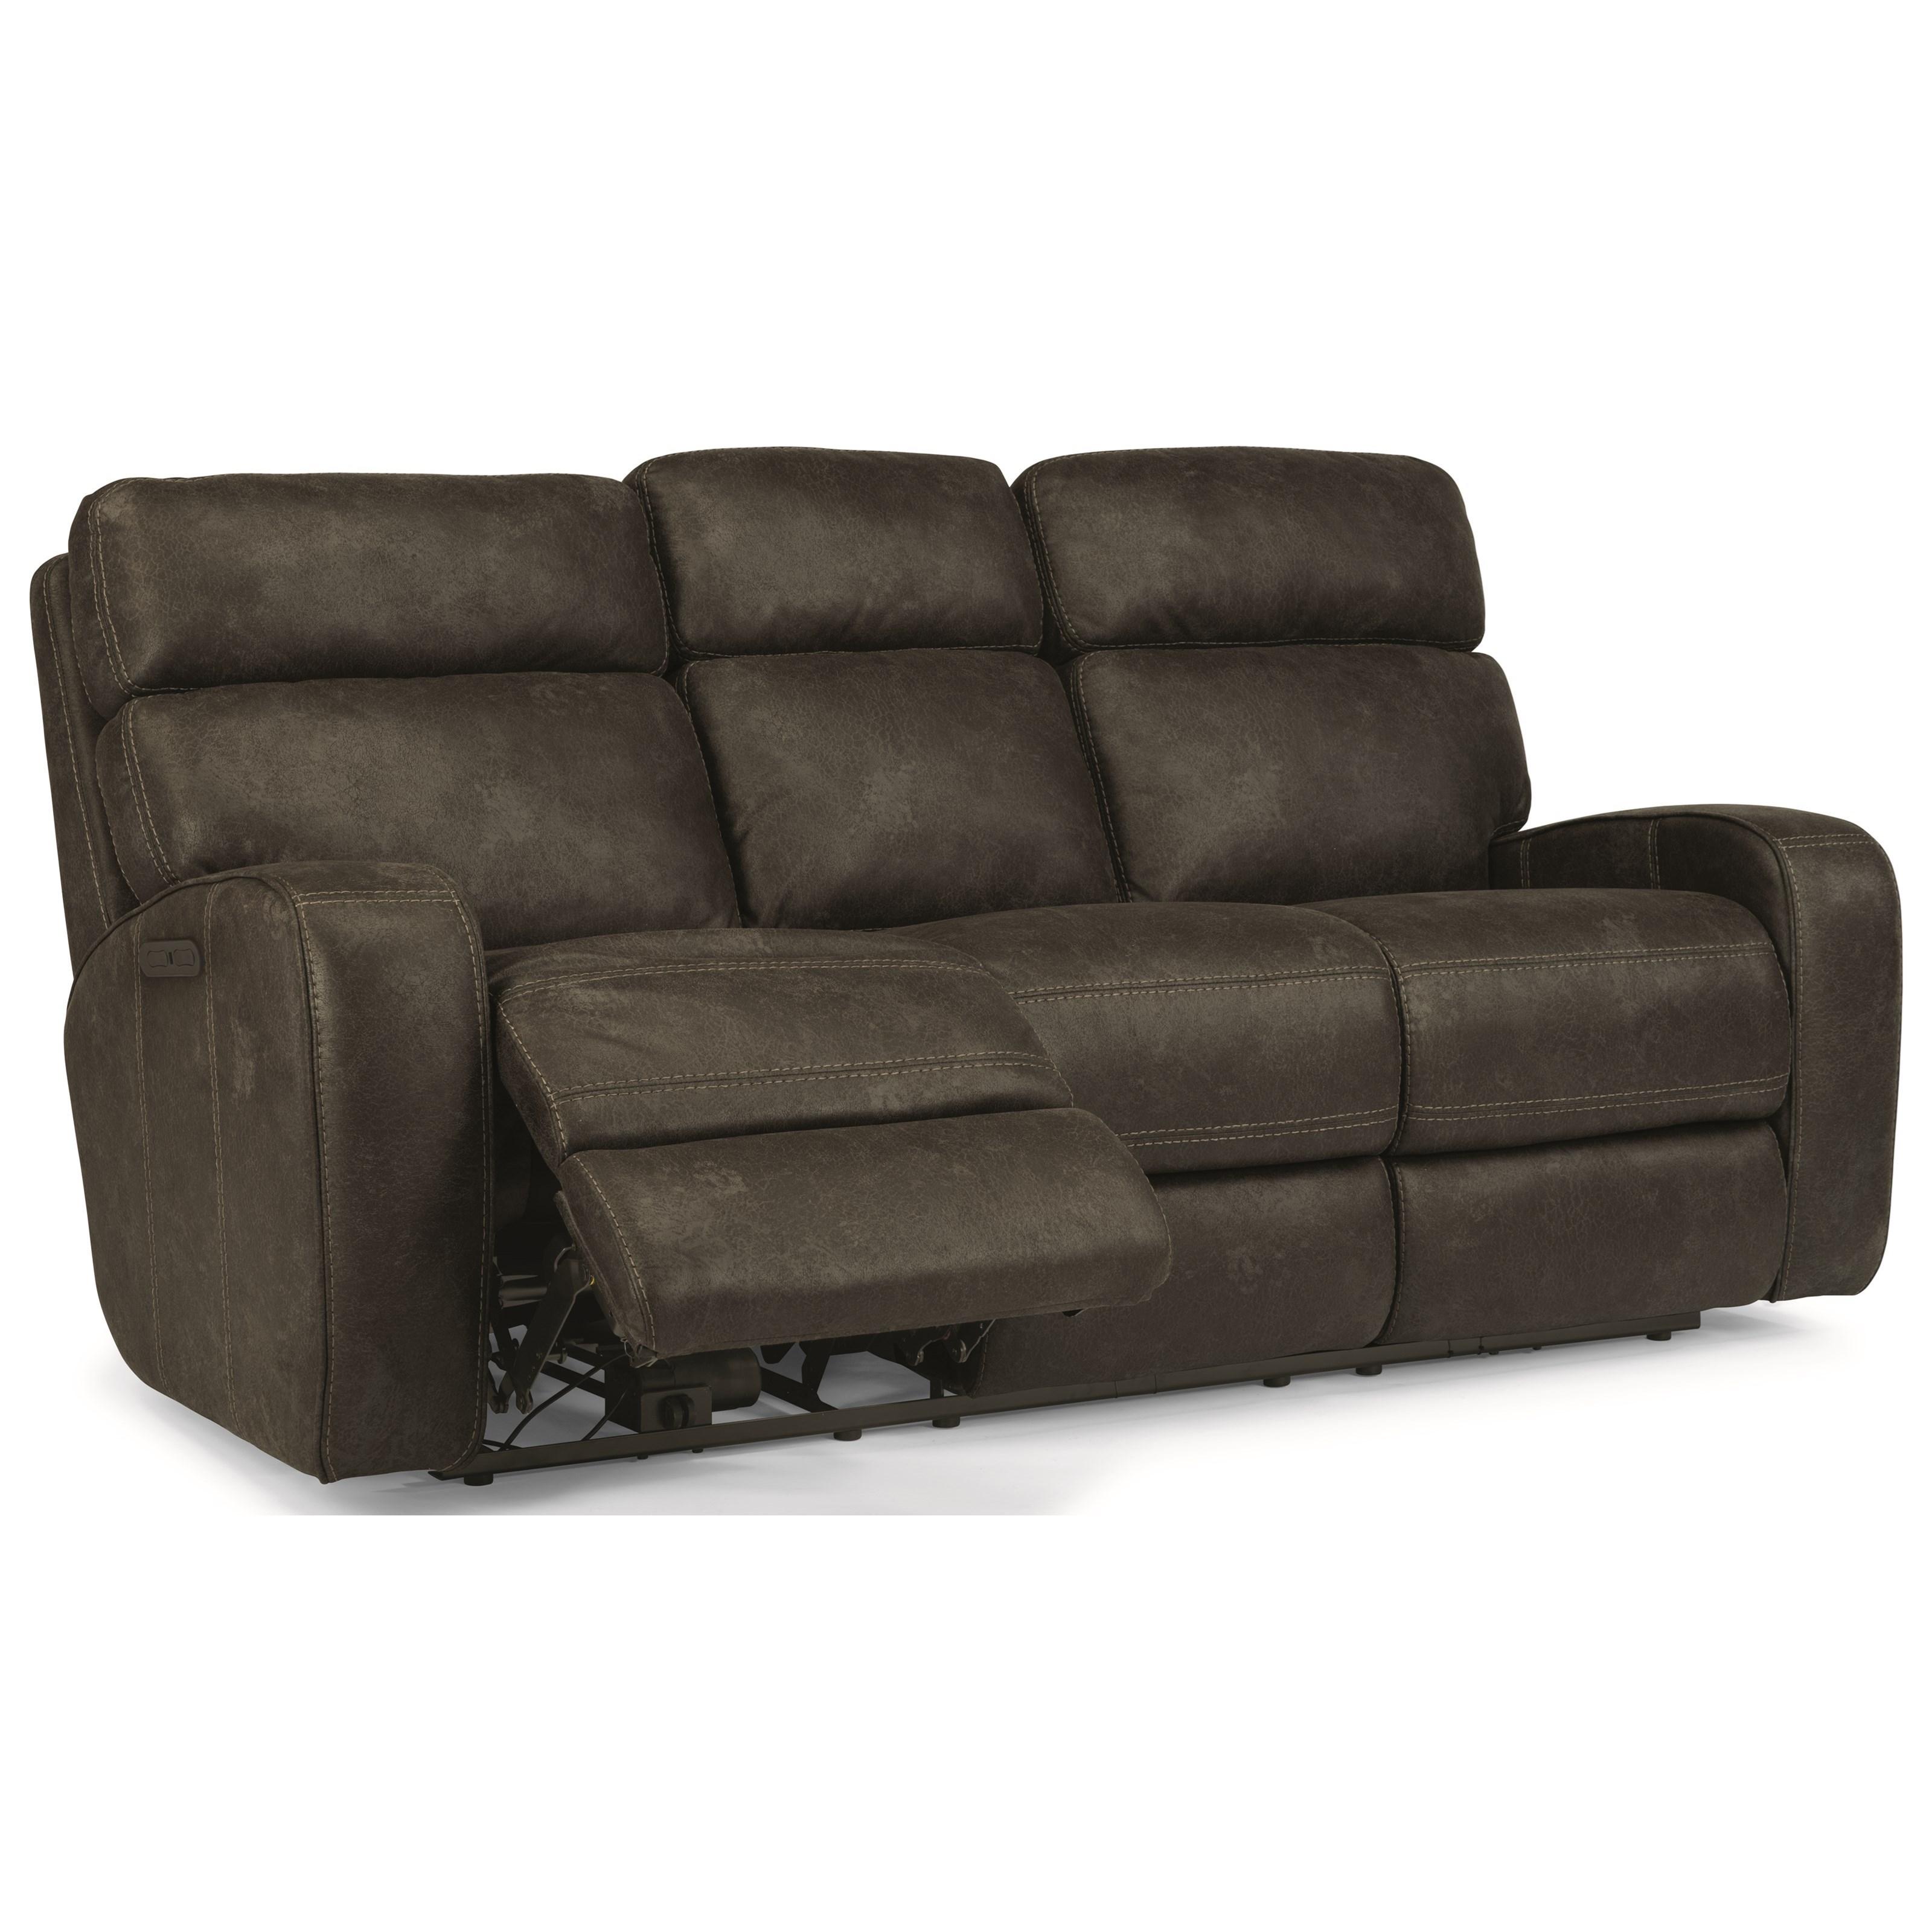 flexsteel power reclining sofa with usb port and power adjustable headrest - Flexsteel Sofas